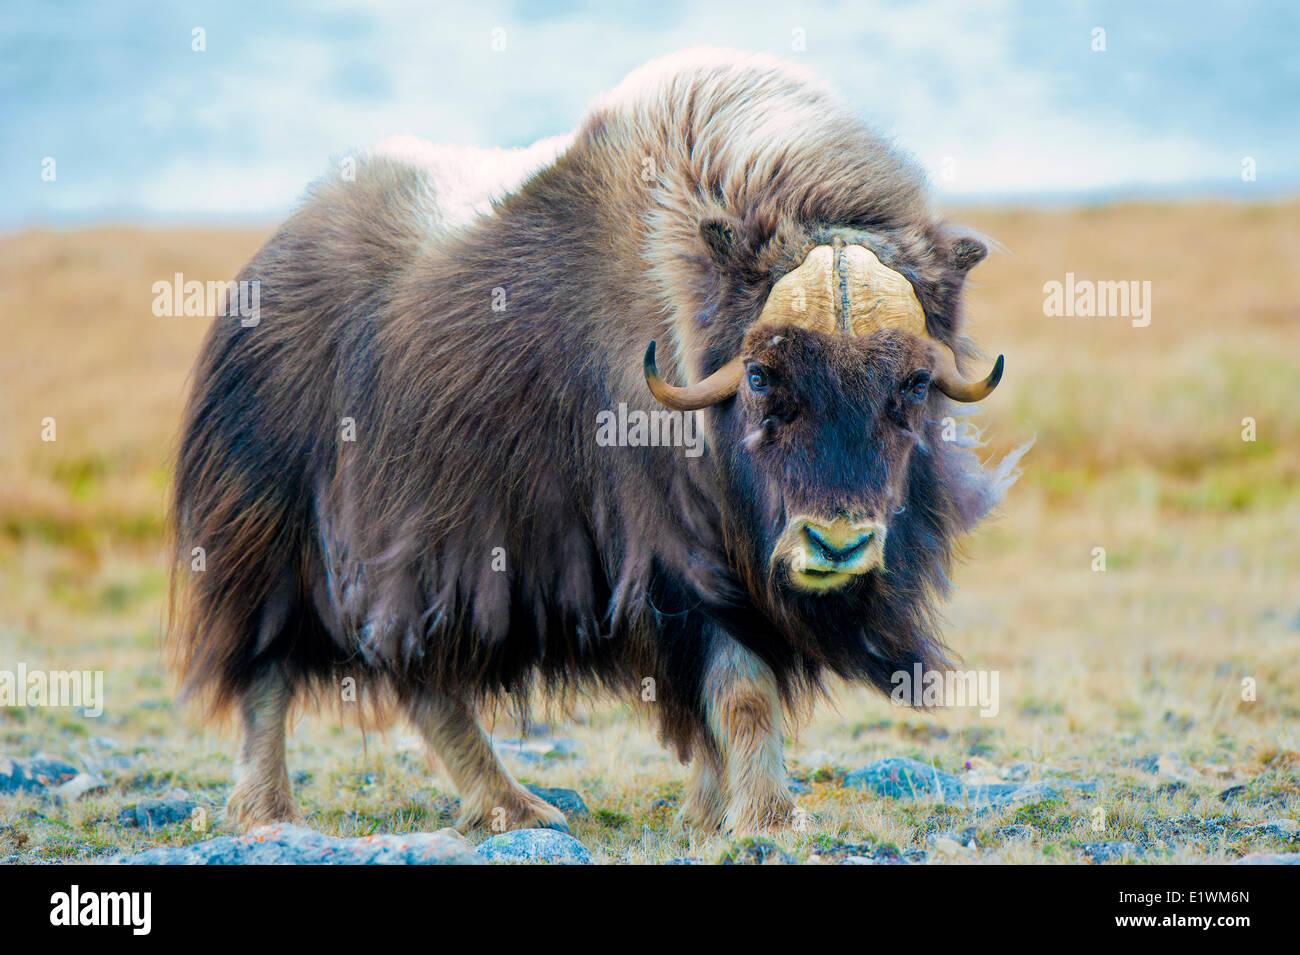 Boeuf musqué (Ovibos moschatus) Bull, île Victoria, Nunavut, Canada l'Arctique Banque D'Images